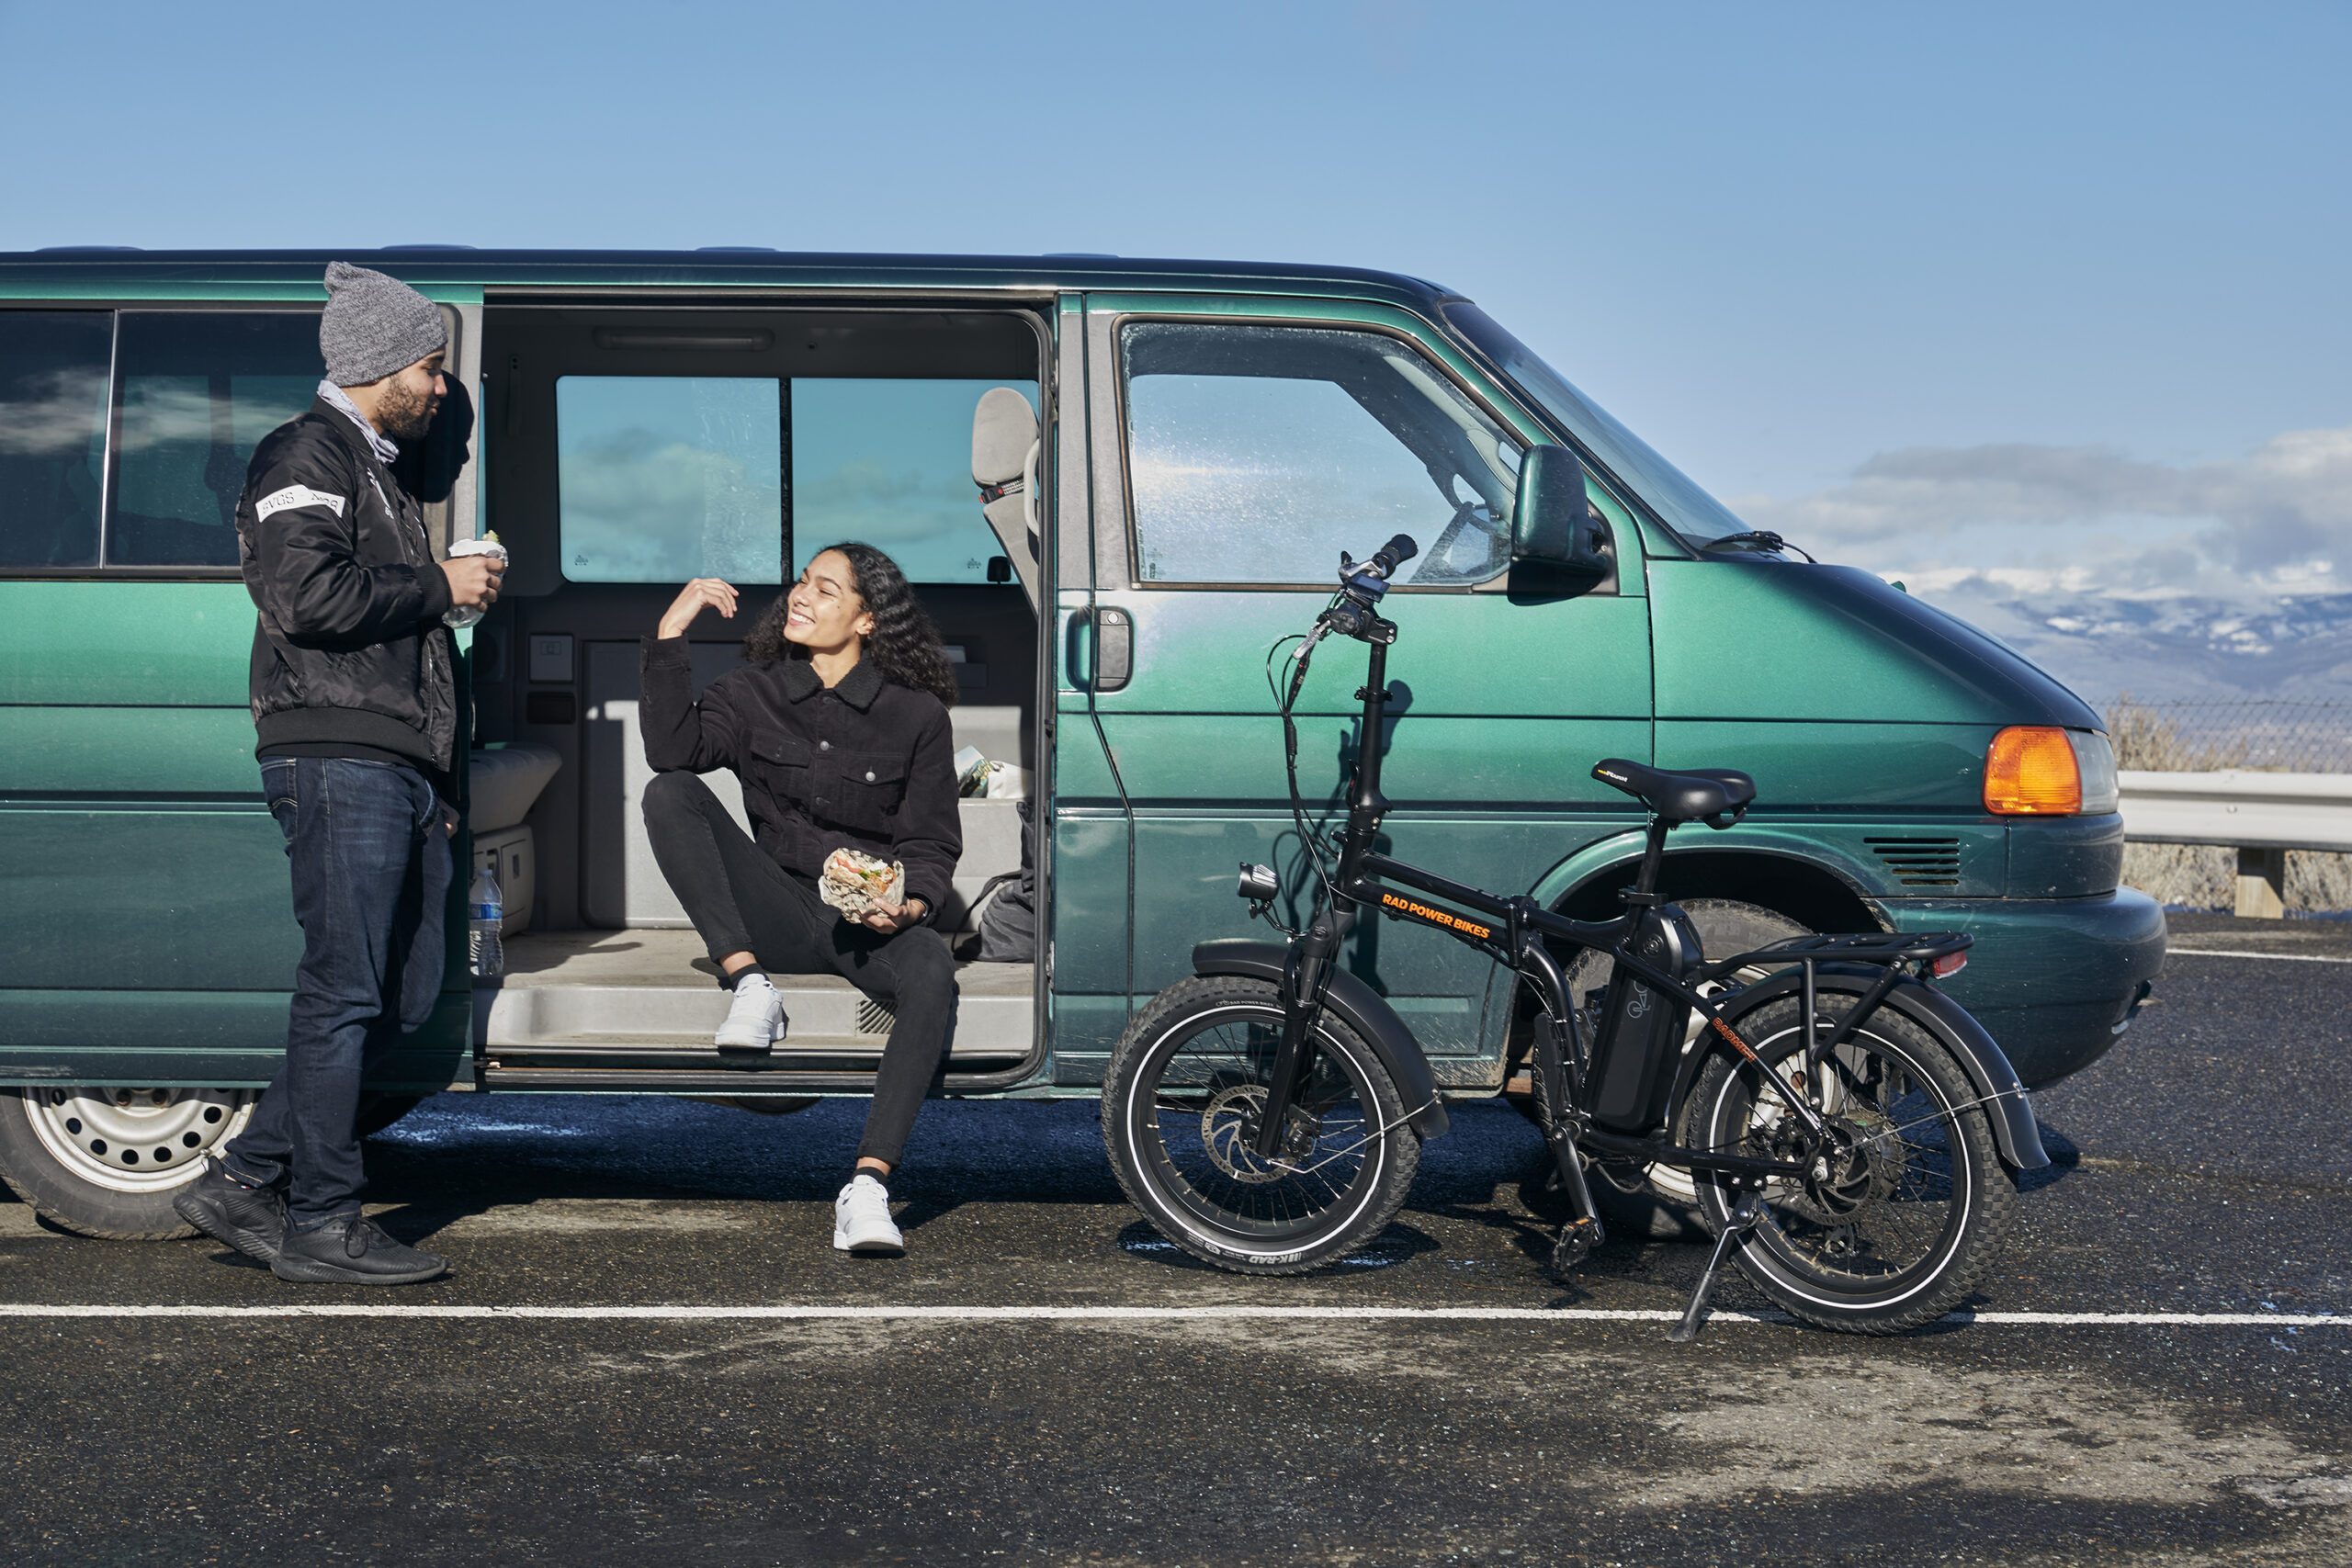 RadMini 4 Electric folding fat bike in front of a van on a beach